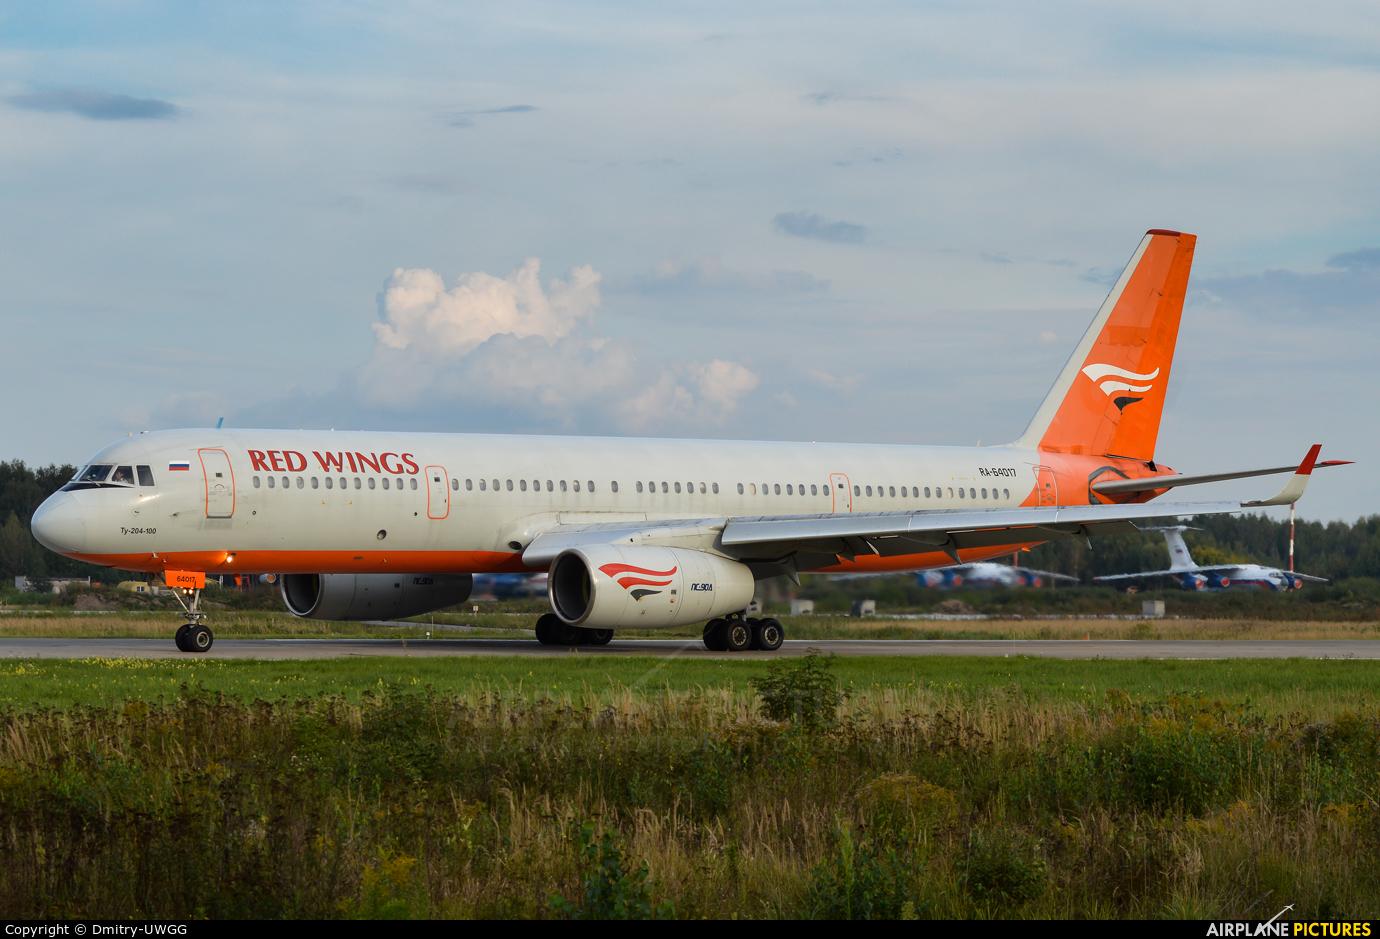 Red Wings RA-64017 aircraft at Nizhniy Novgorod